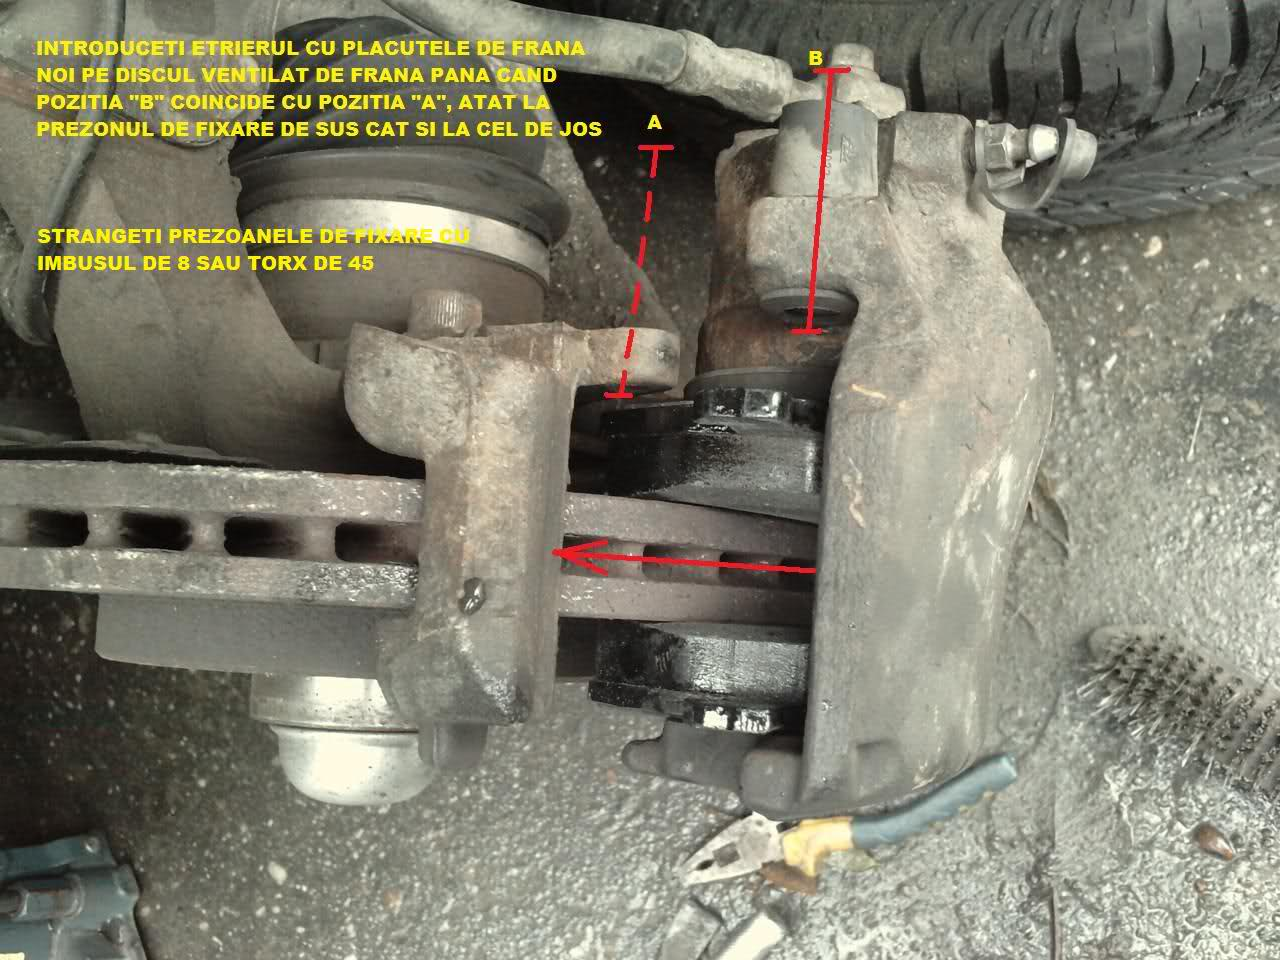 Tutorial inlocuire placute de frana pe fata la Vectra B. 2hf15x4